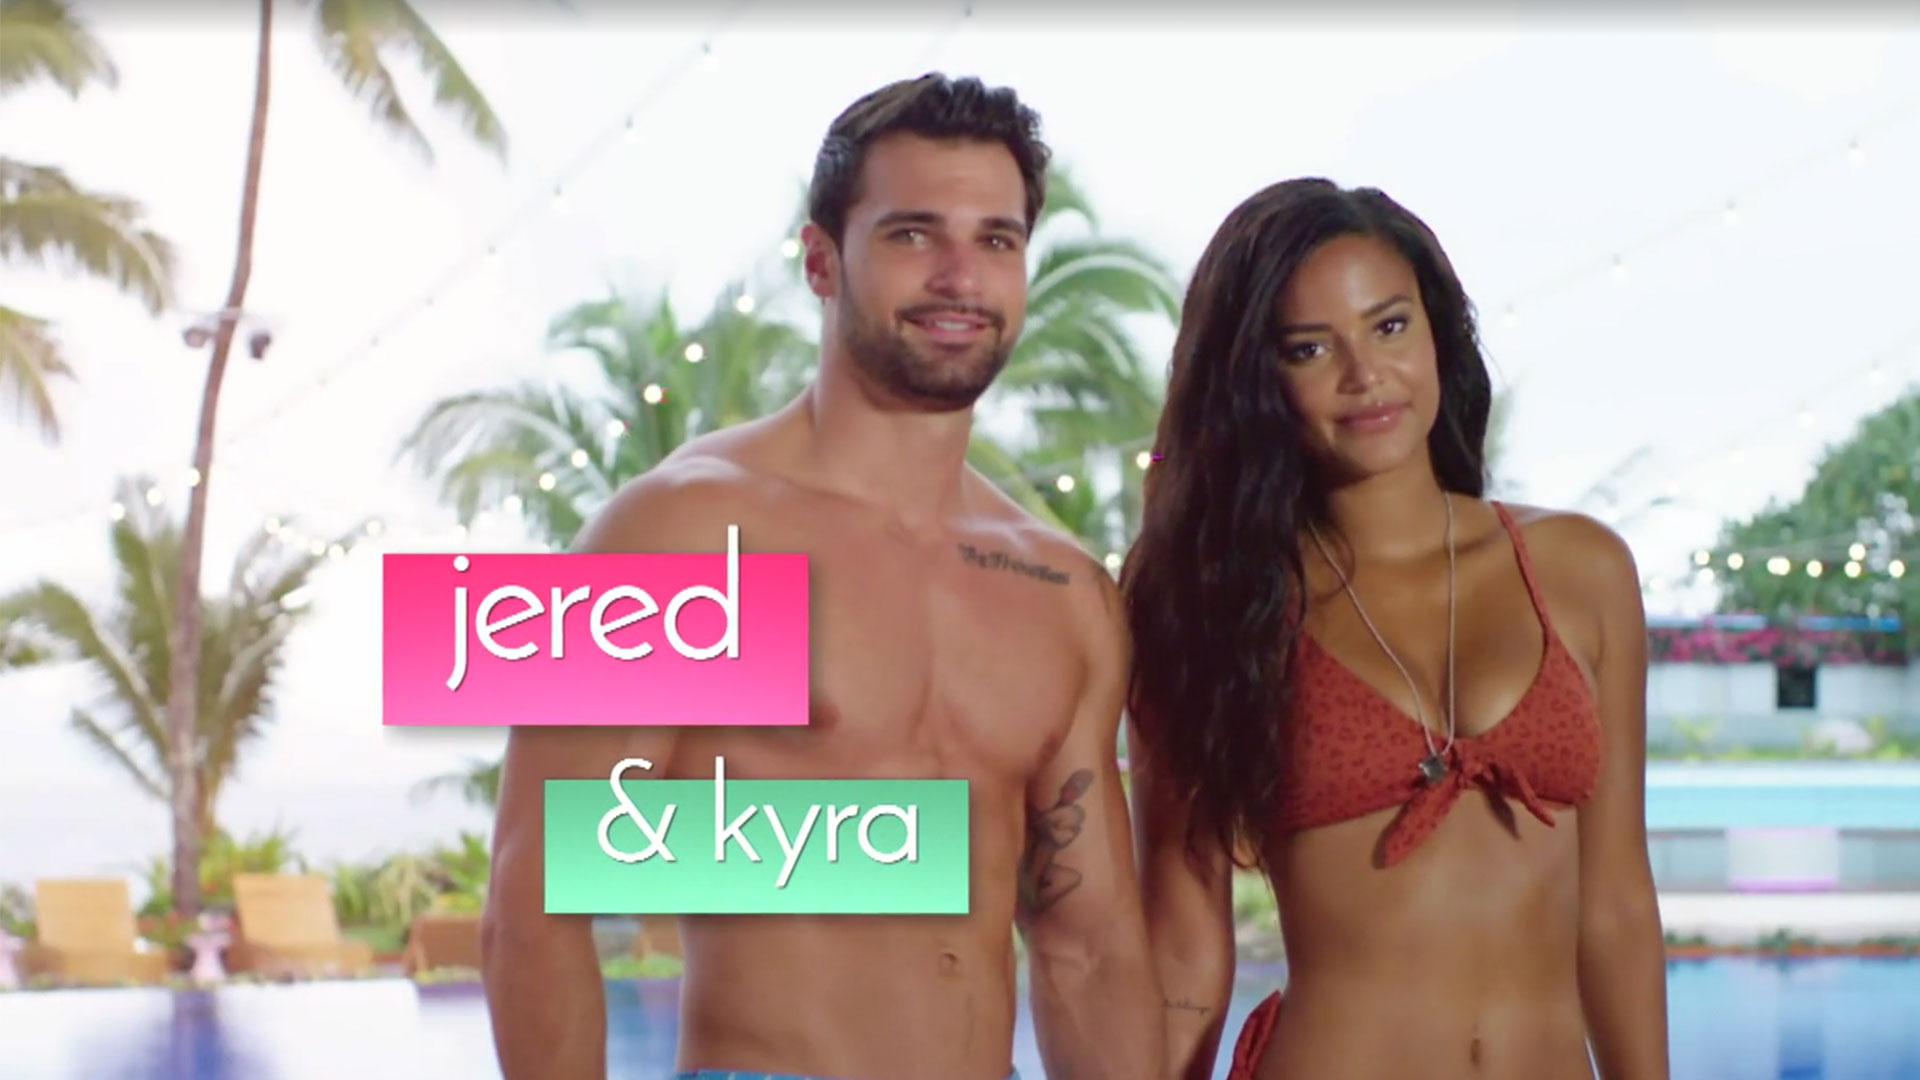 Jered and Kyra